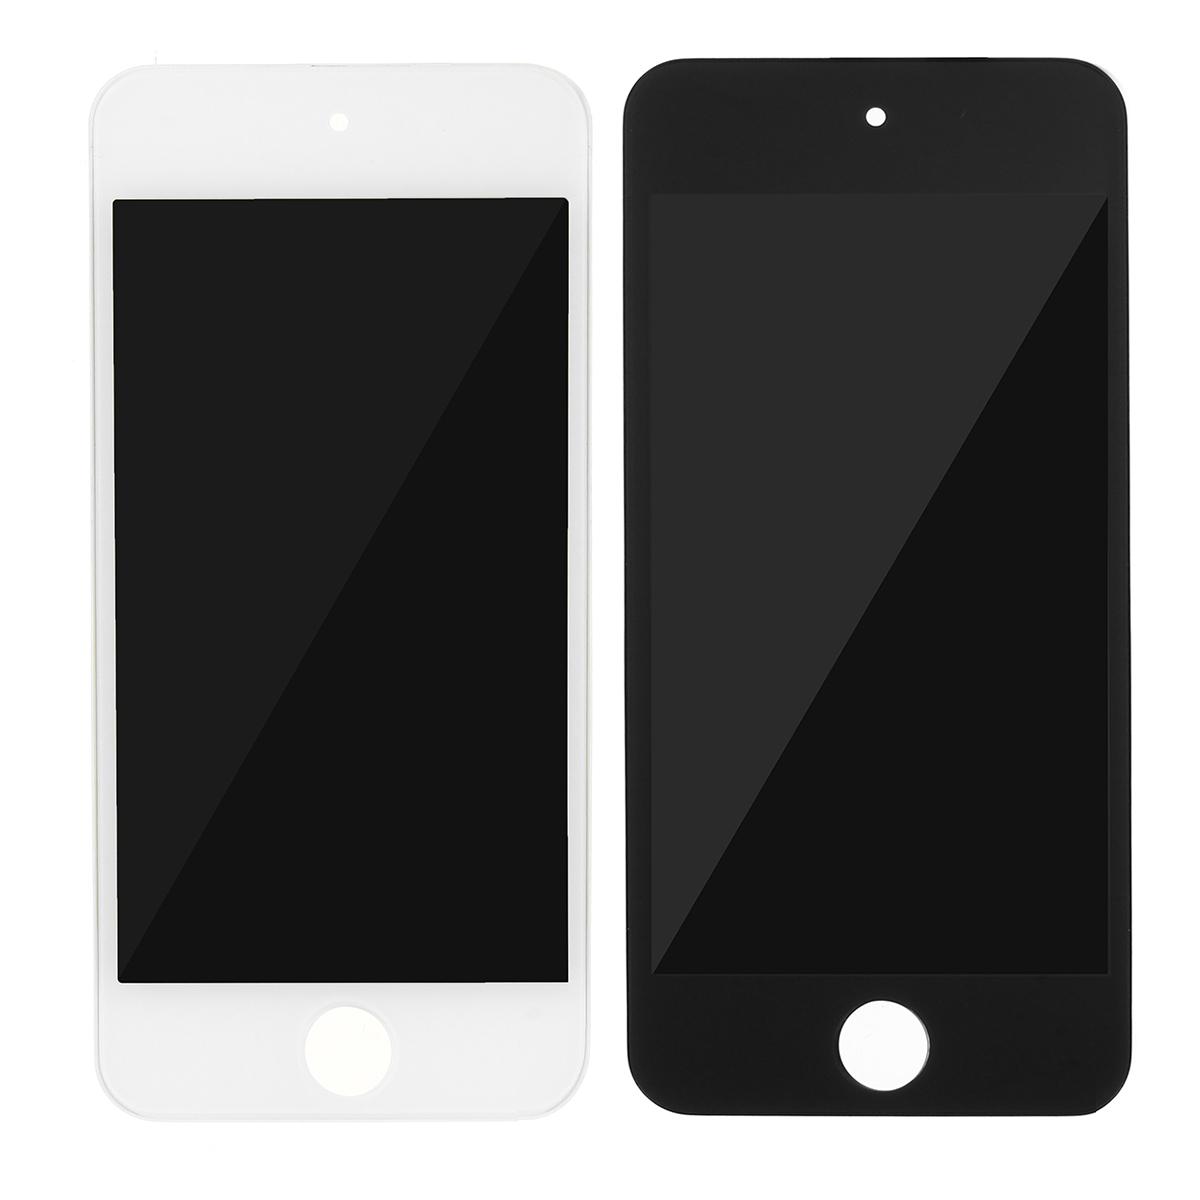 پنل-تاچ-صفحه-نمایش-آیپاد-lcd-display-touch-screen-Apple-iPod-Touch-5th(1).jpg